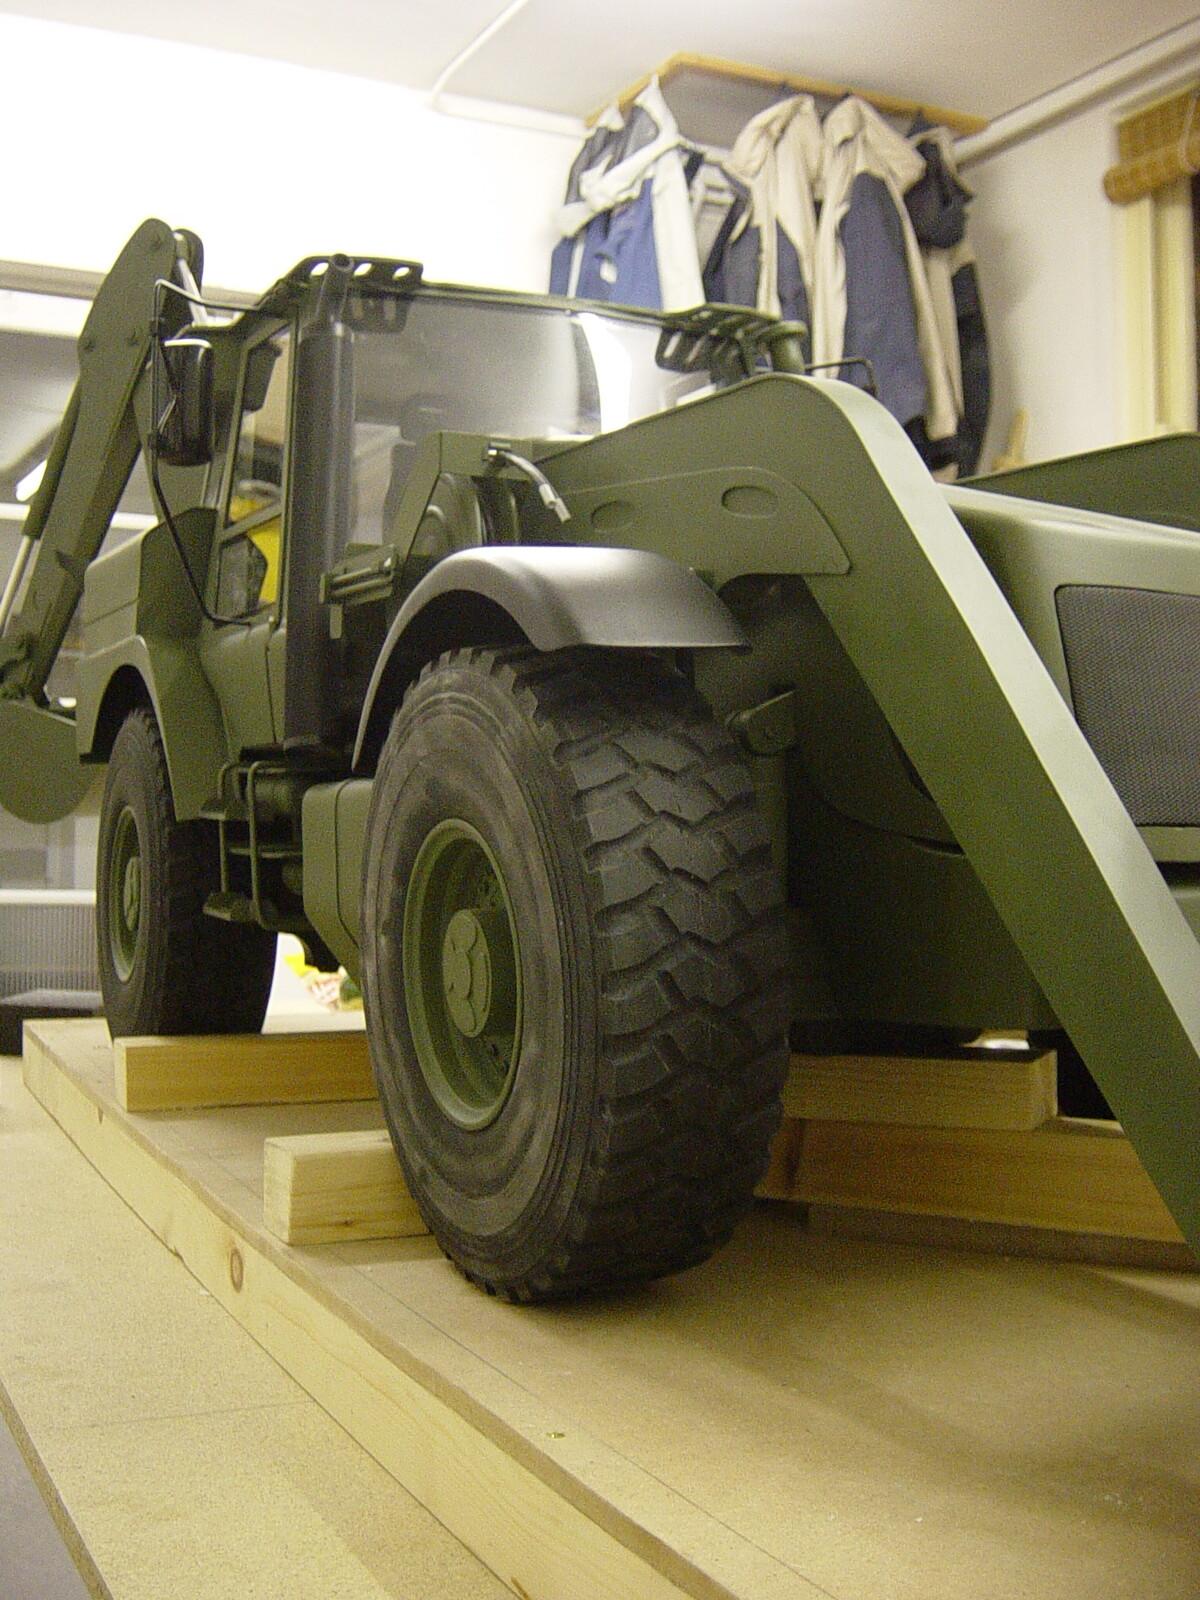 1:5 scale JCB HMEE vehicle